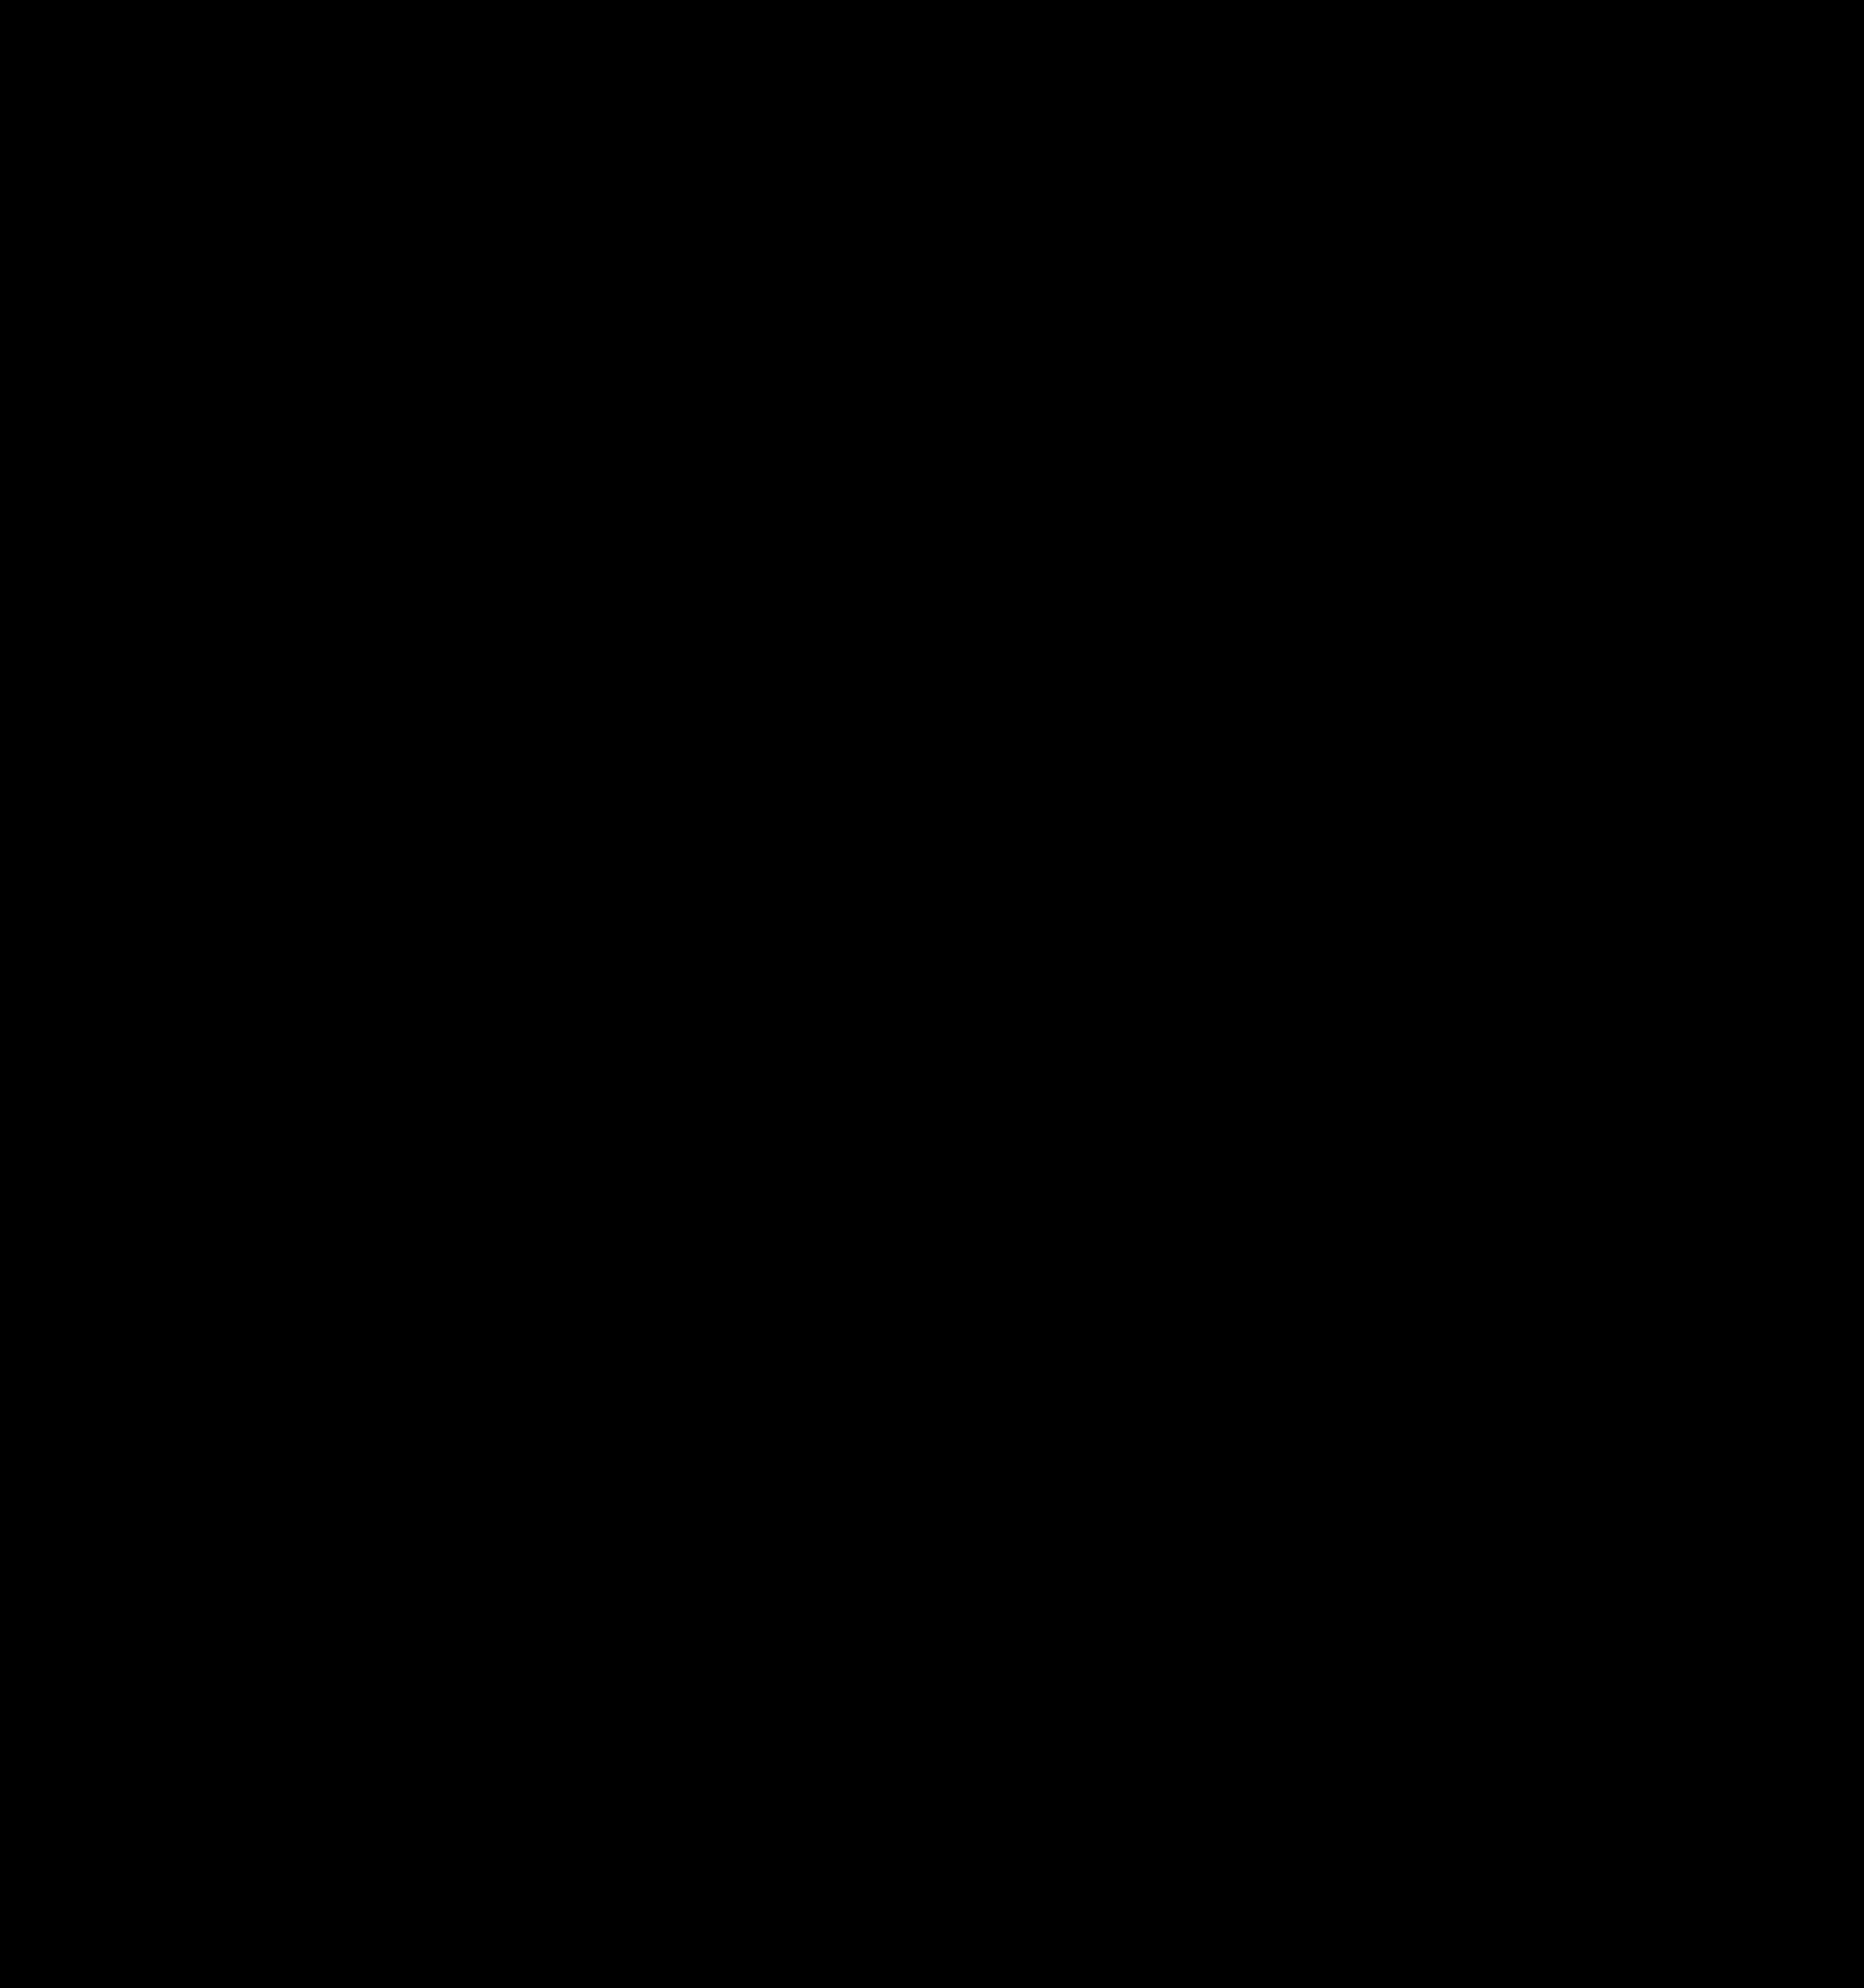 Clipart birds fish. Bird silhouette big image